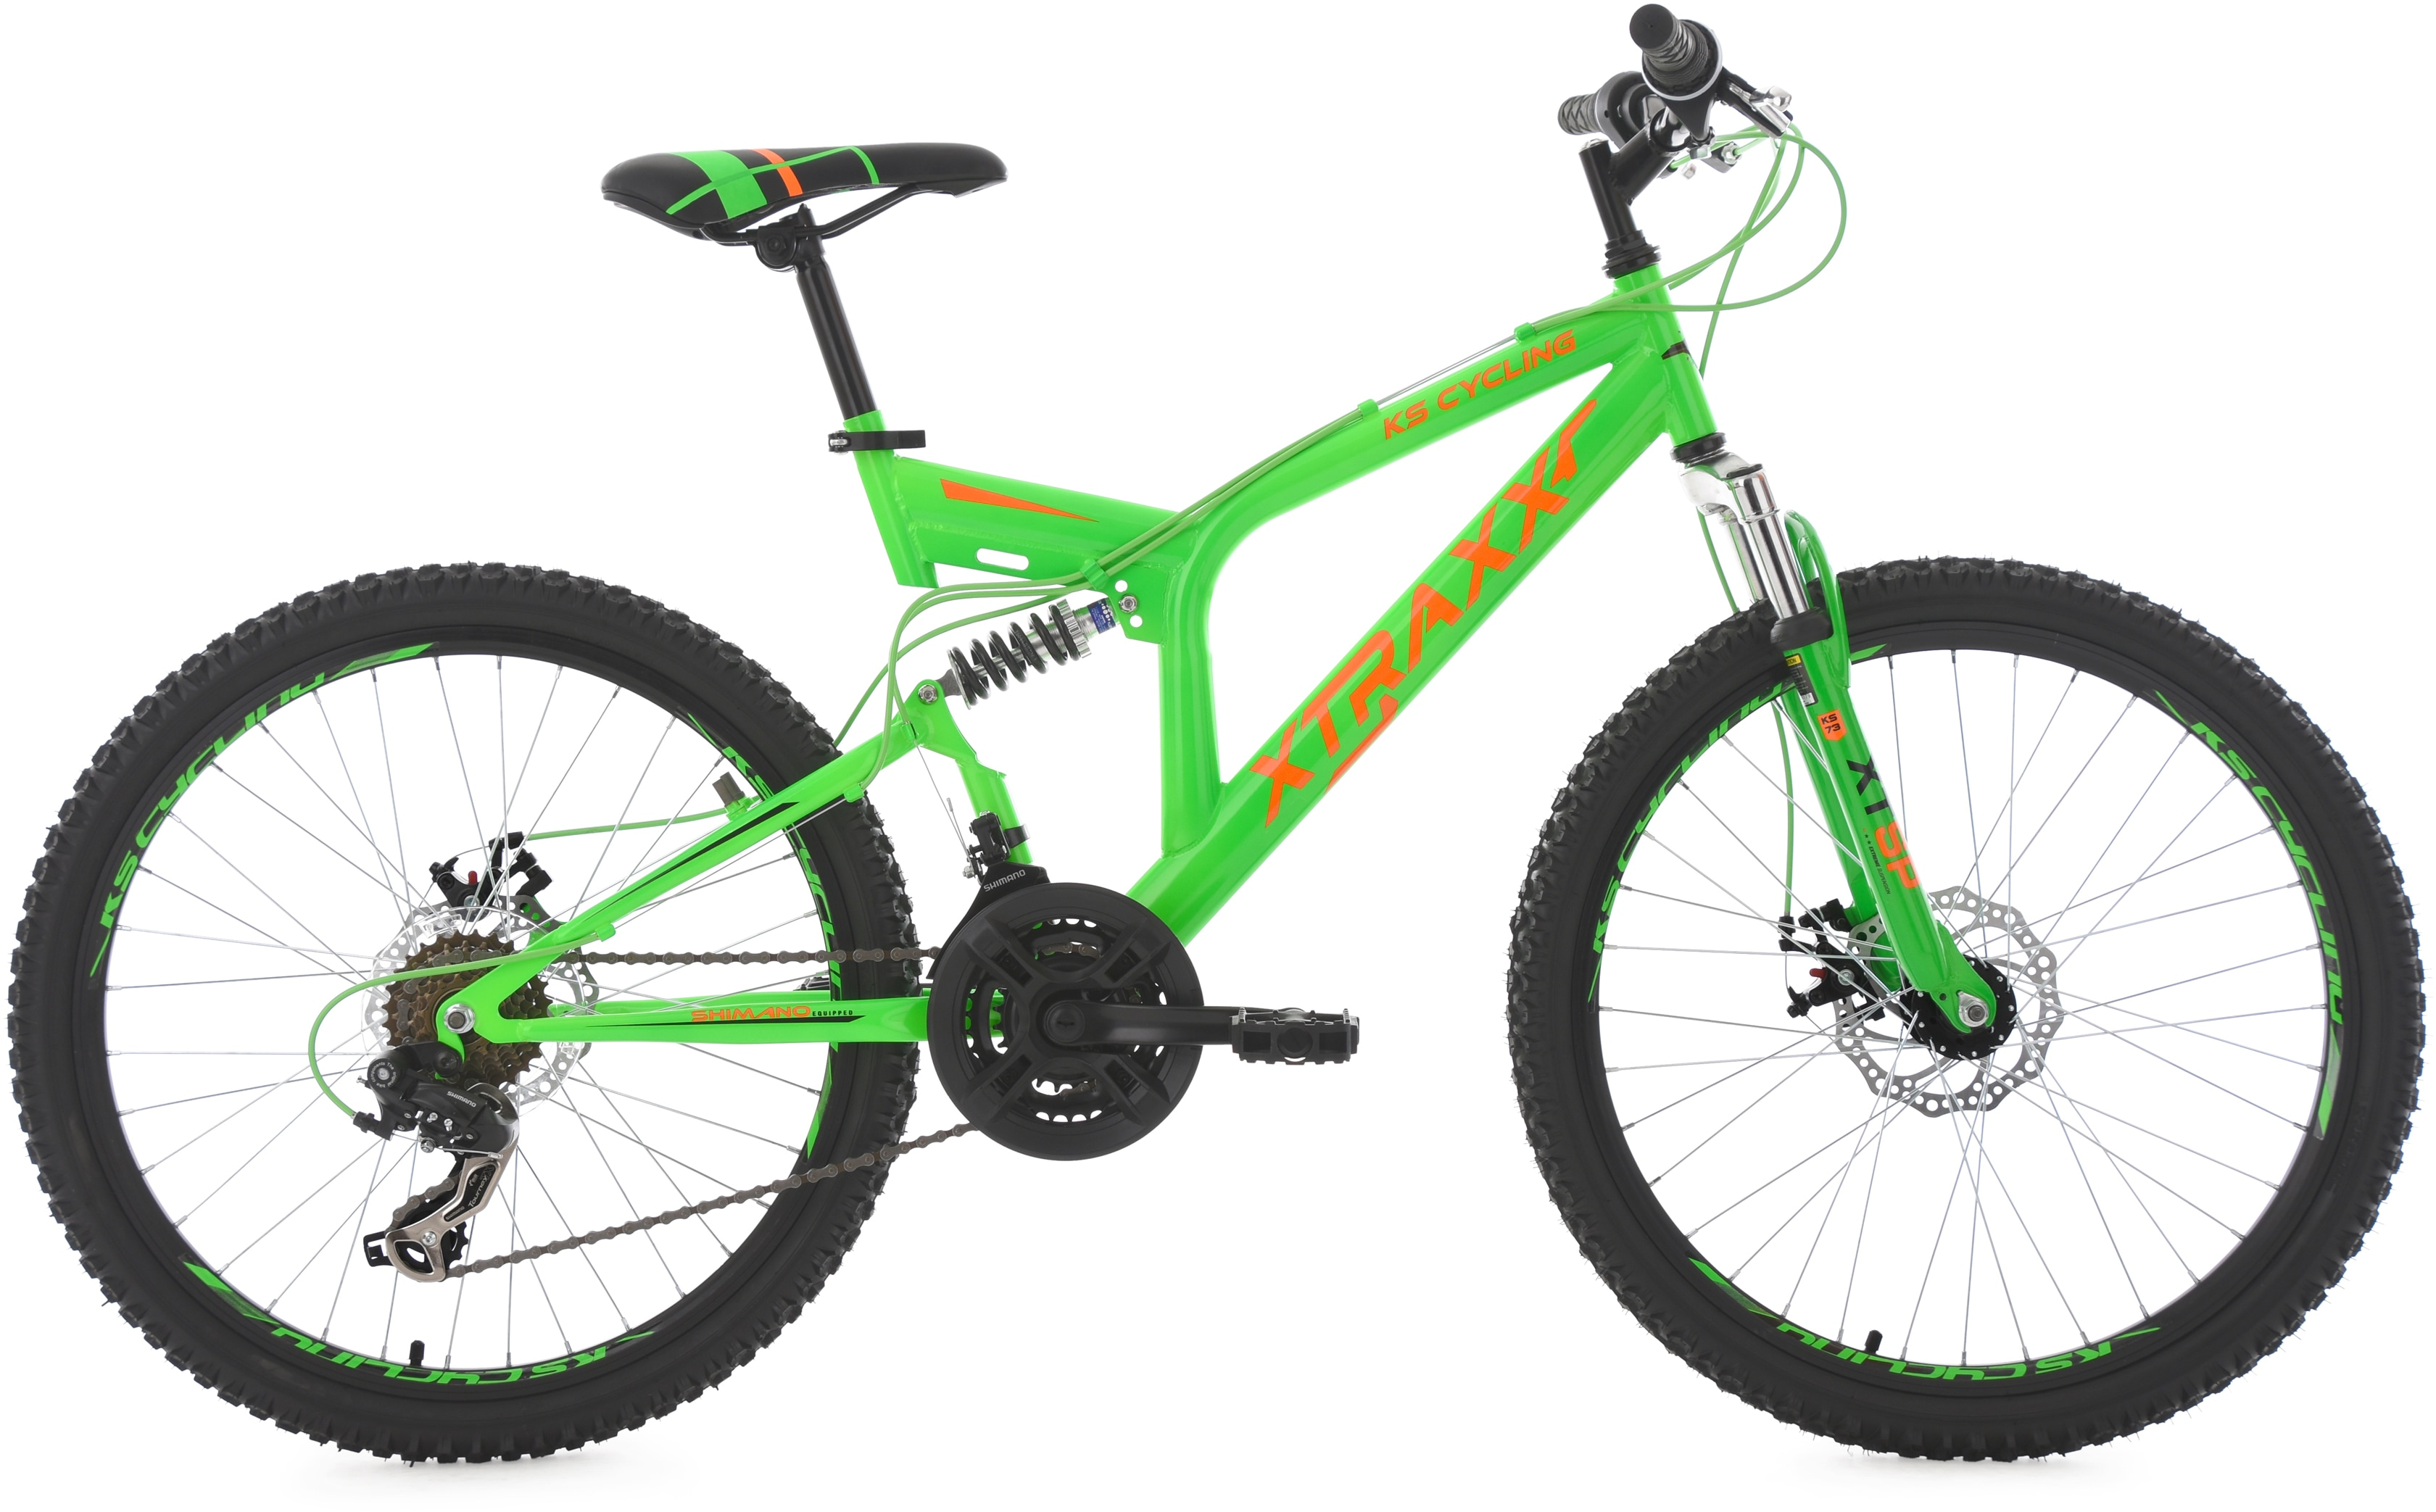 KS Cycling Jugendfahrrad XTRAXX, 21 Gang, Shimano, Tourney Schaltwerk, Kettenschaltung grün Kinder Kinderfahrräder Fahrräder Zubehör